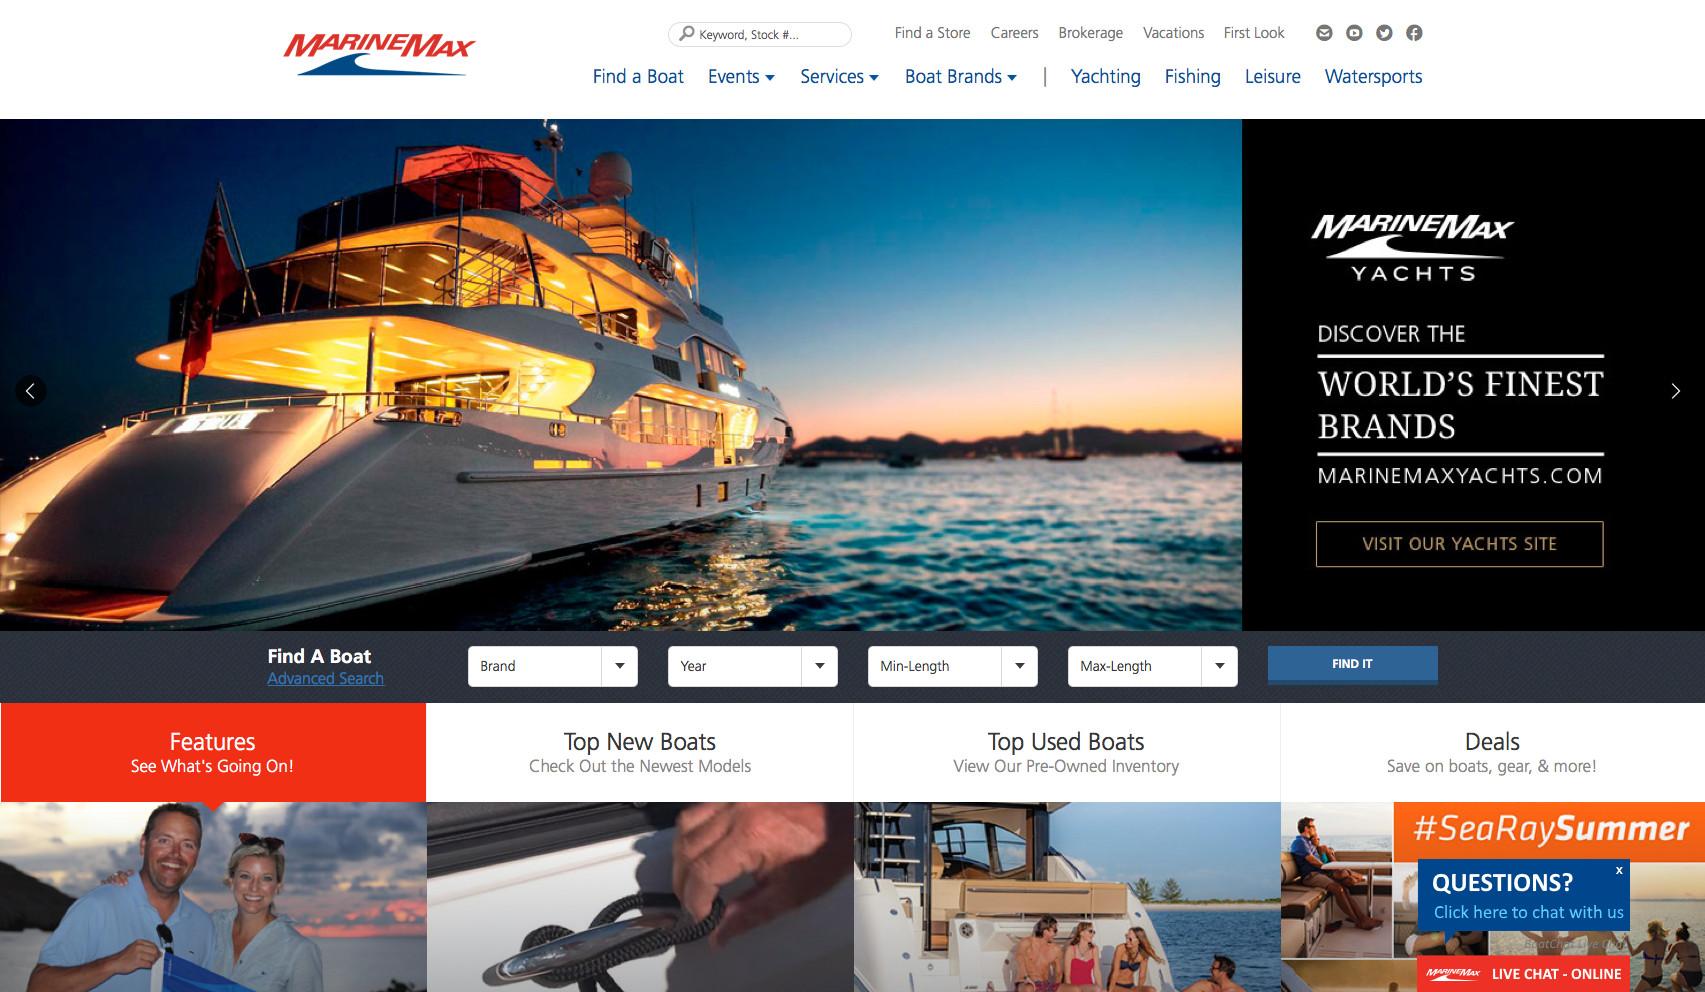 BmTec Marinemax Yachts